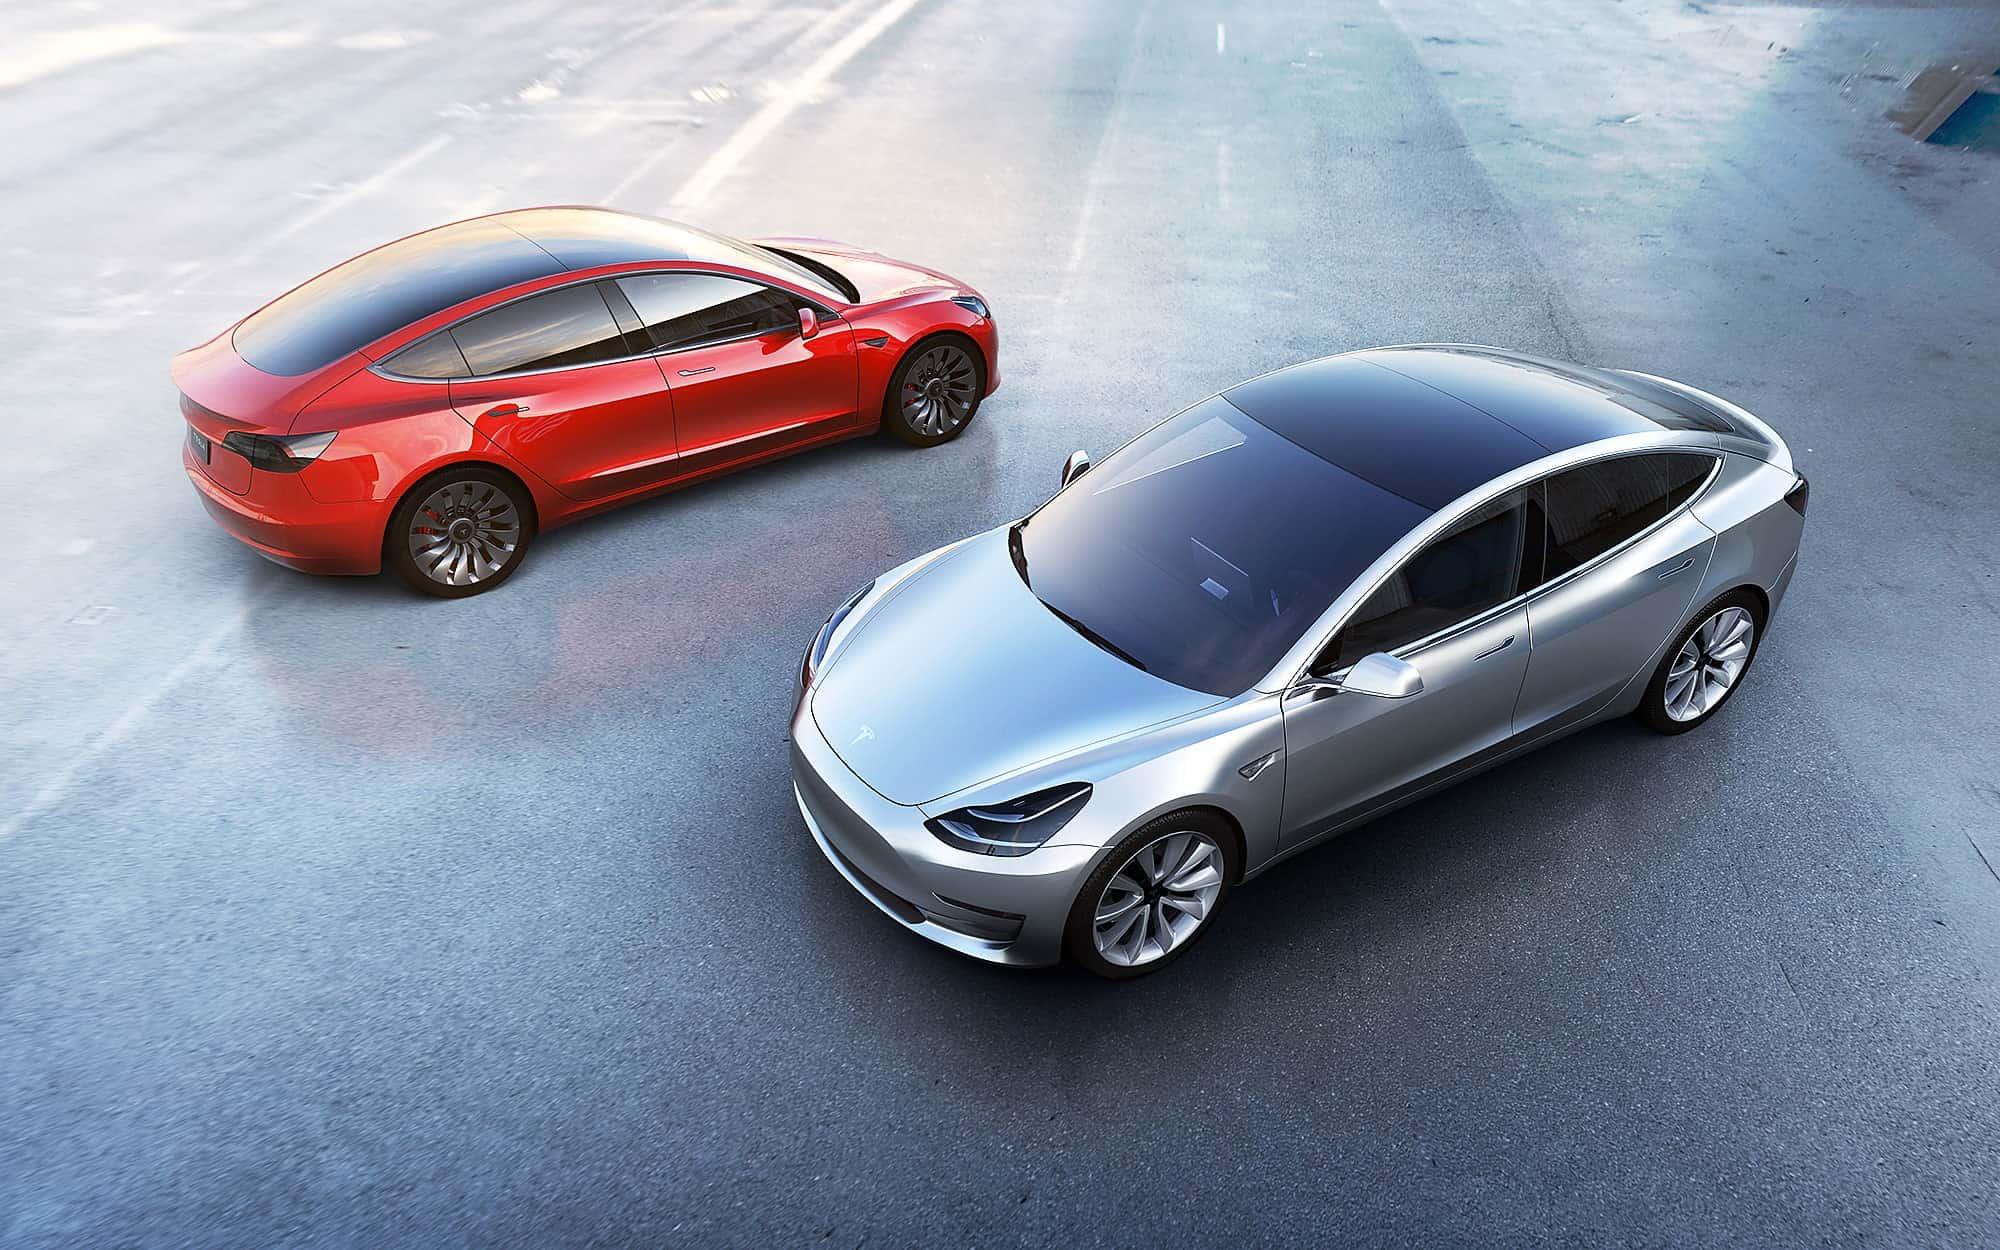 Tesla Model 3 sells 35000+ units in June, 2020